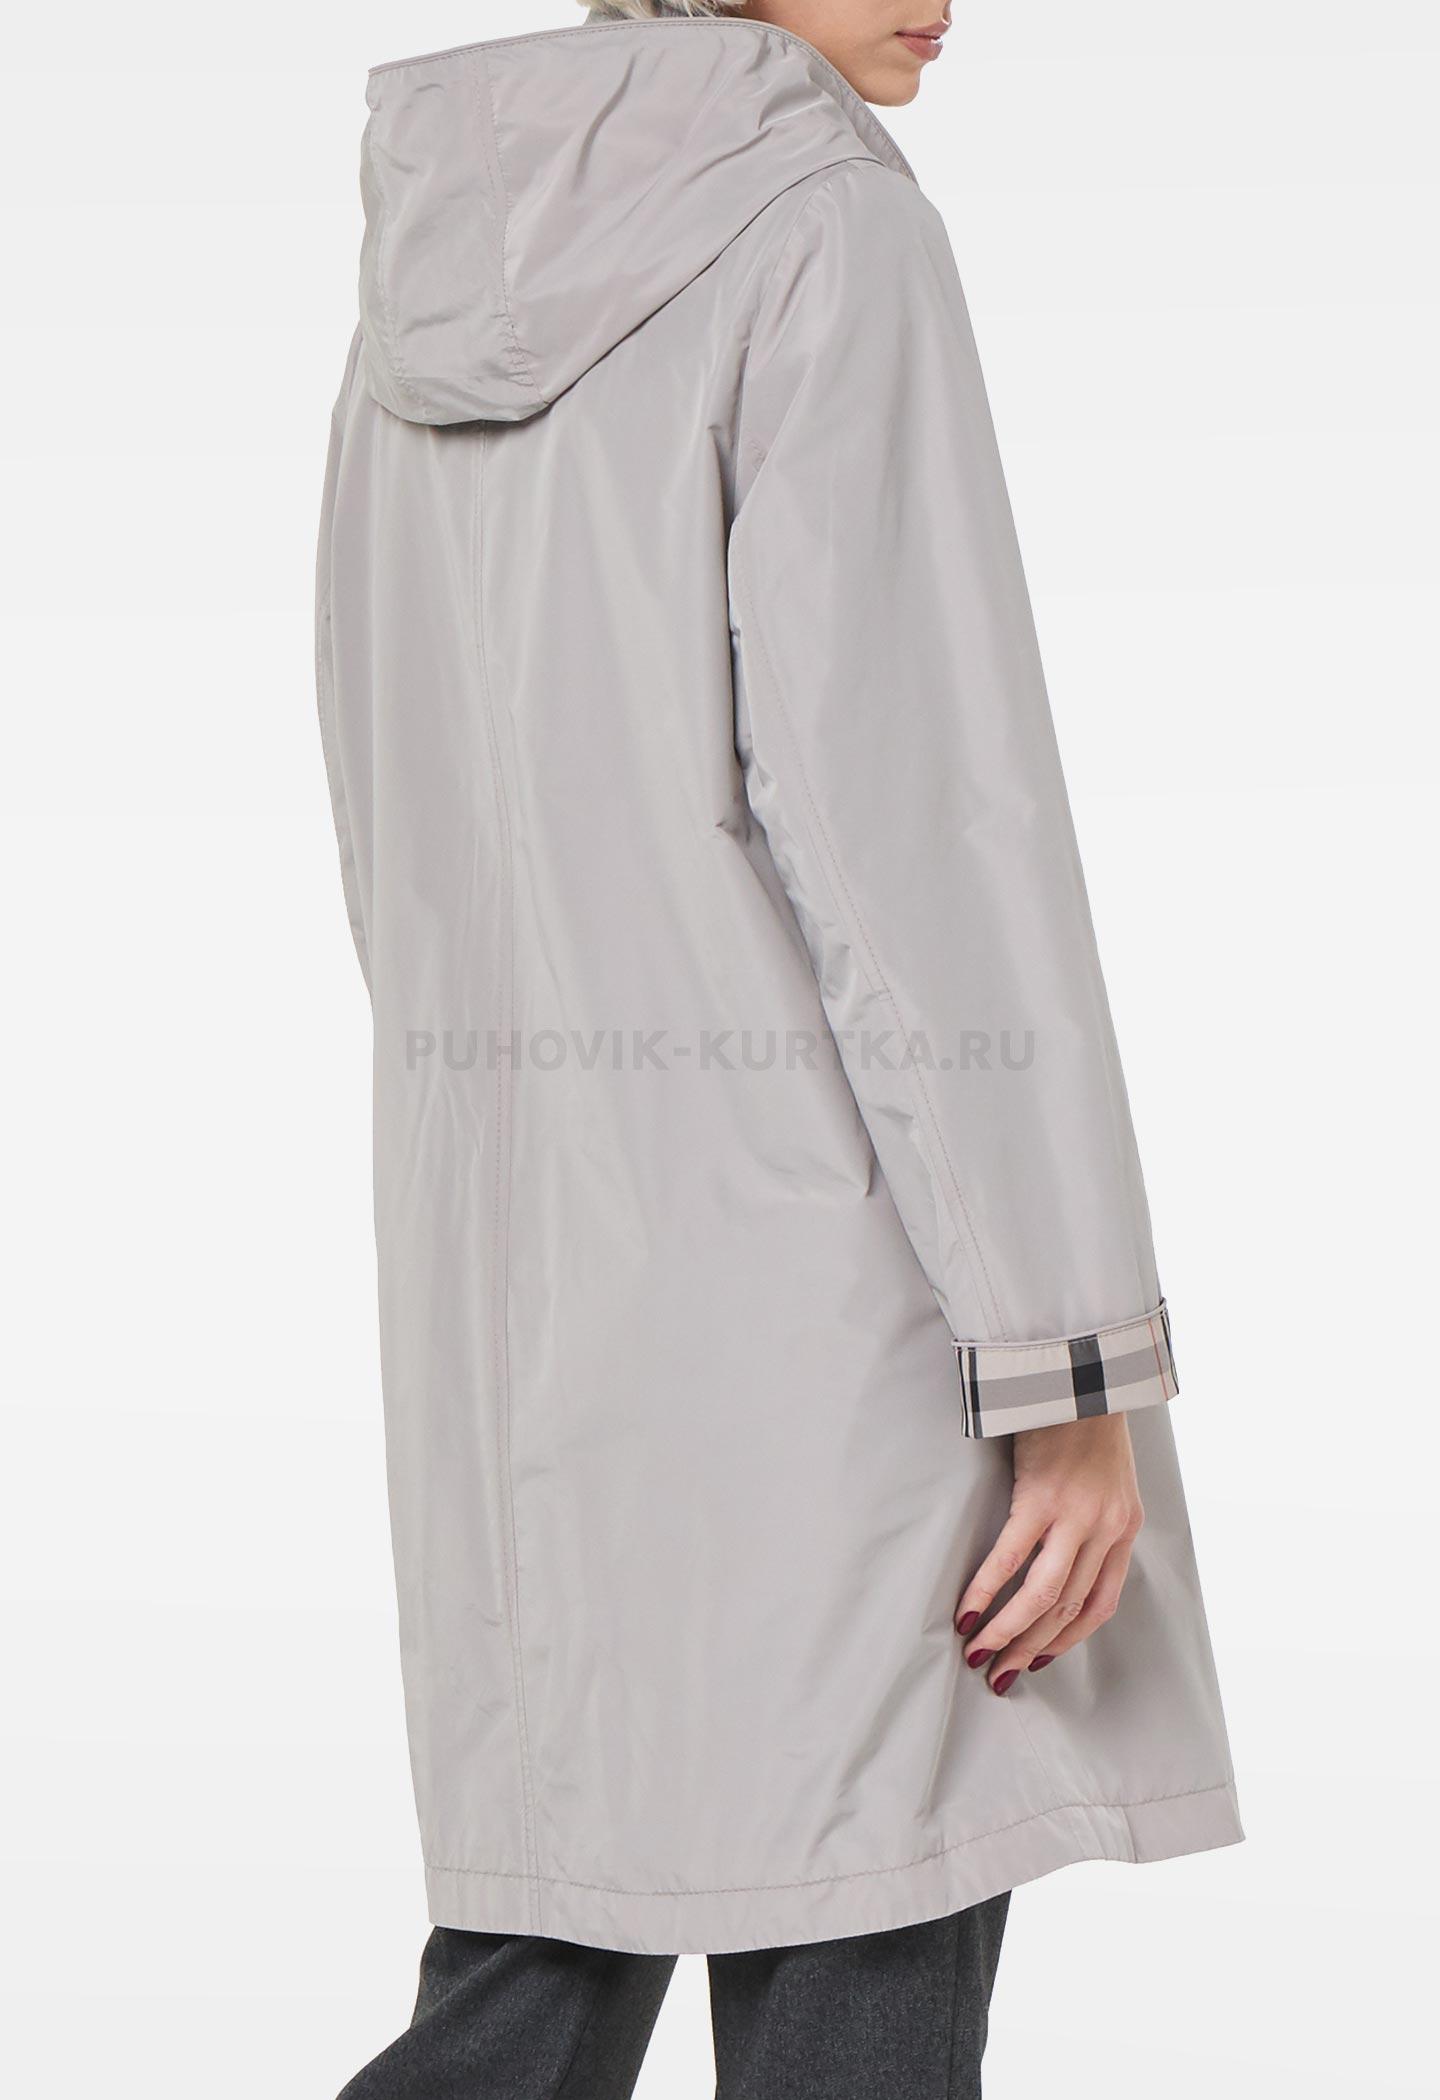 Пальто Dixi Coat 4511-115 (33)